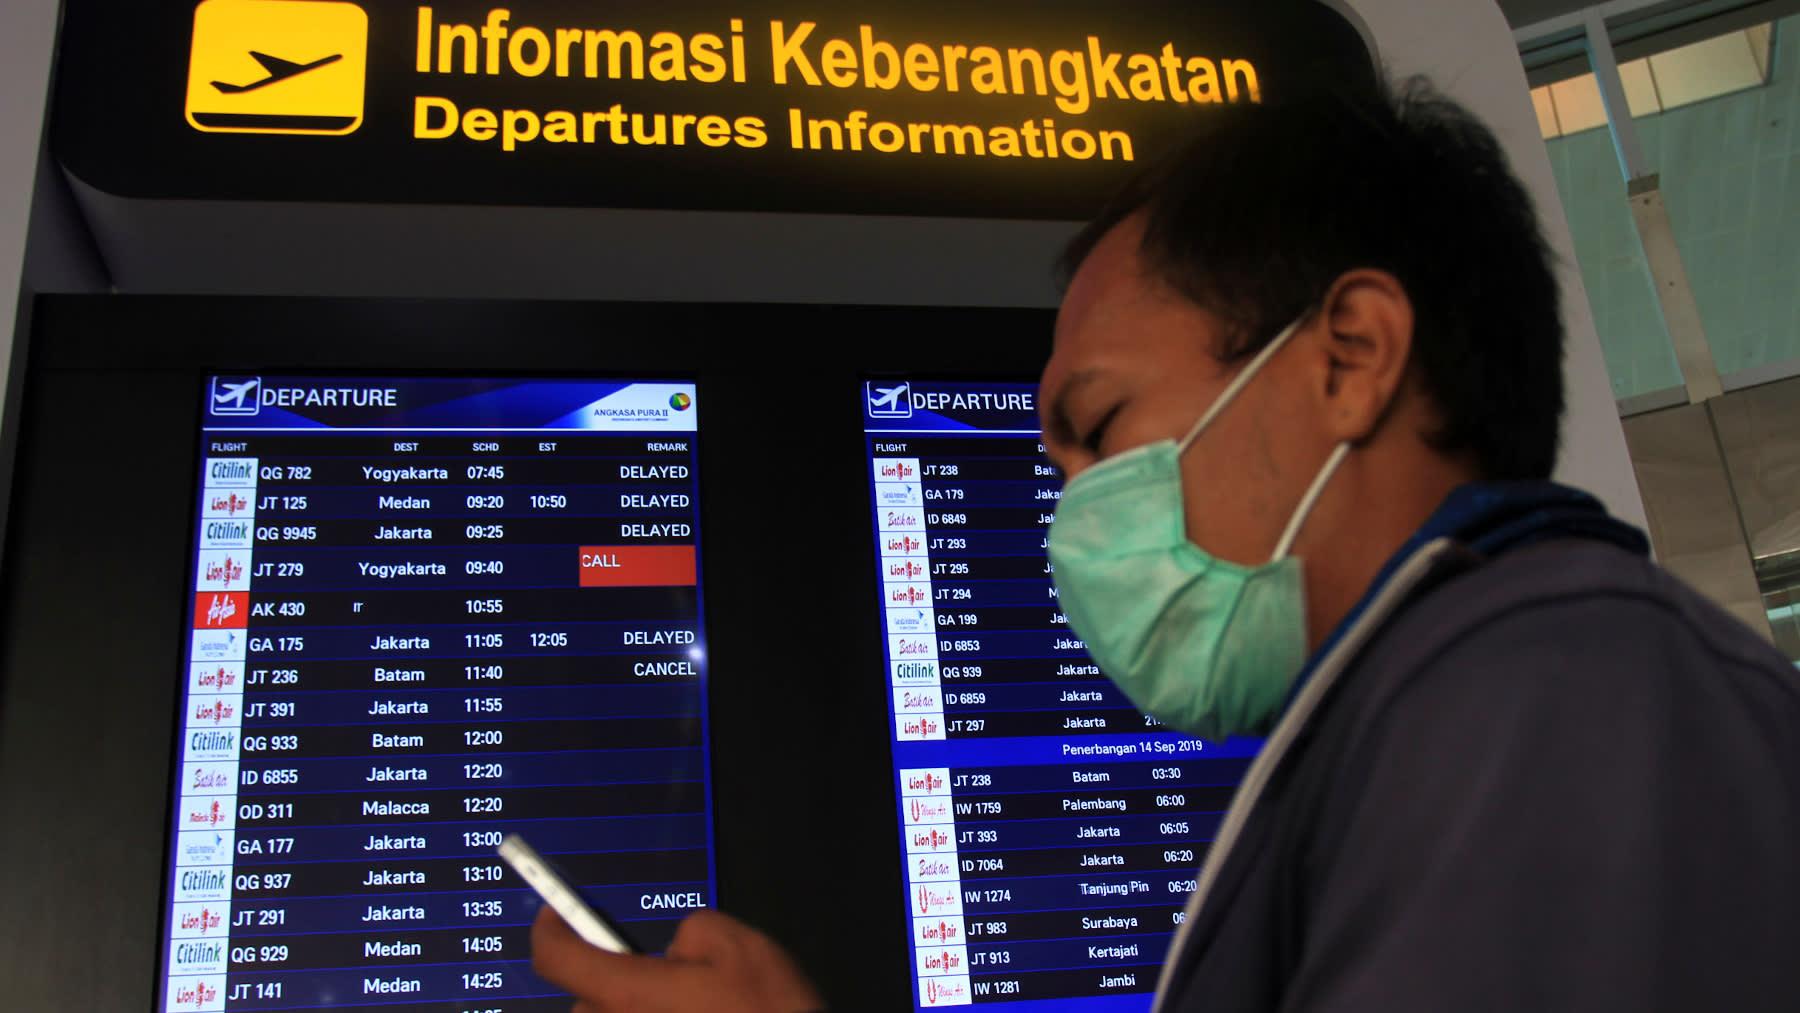 Asia on alert over mysterious virus outbreak in China - Nikkei ...